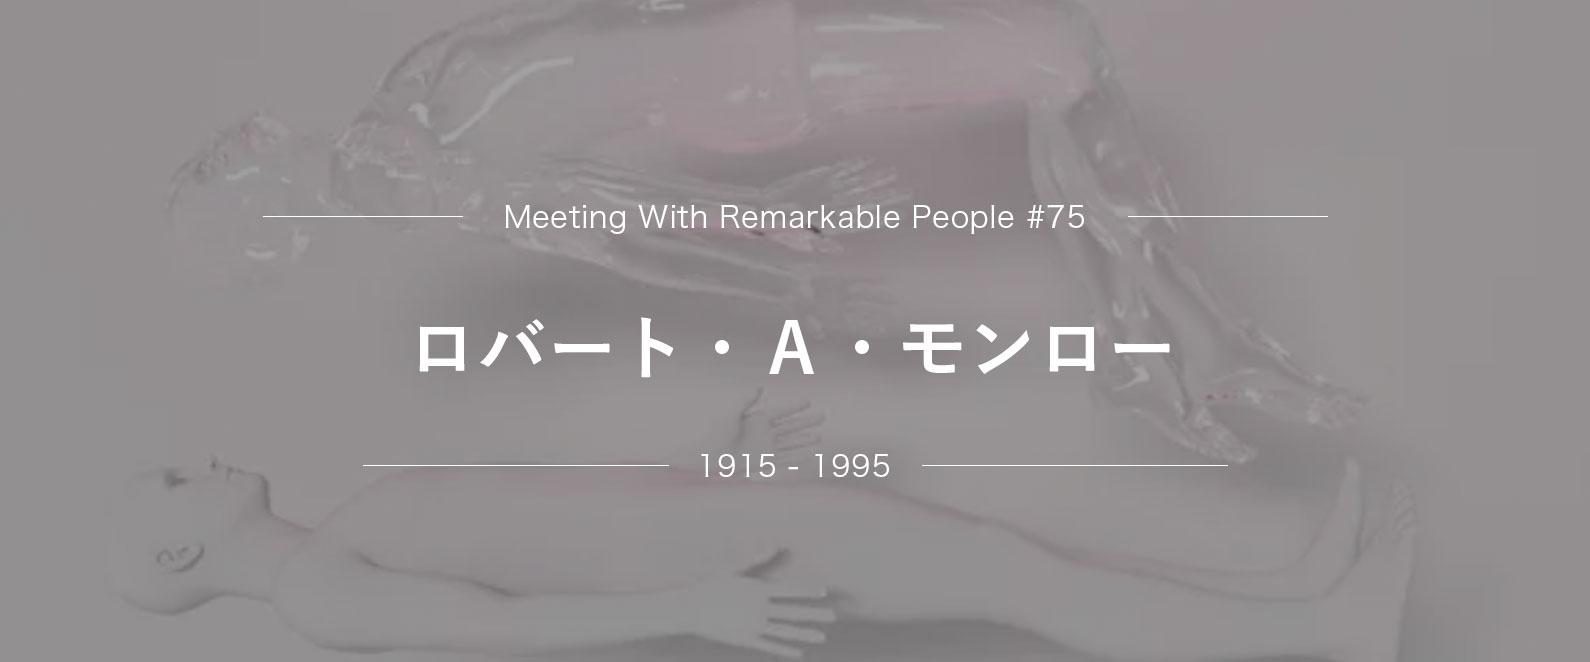 BookClubKAI Storeimg02